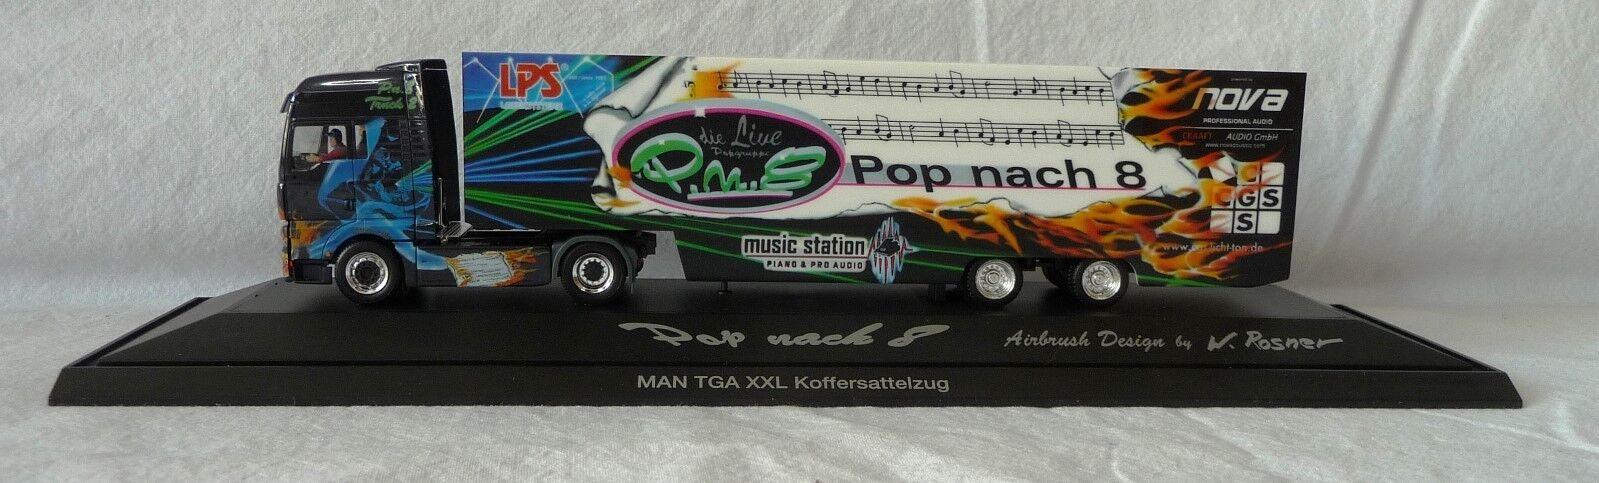 Herpa H0 121217 121217 121217  MAN TGA XXL Koffer-Sattelzug  Pop nach 8 , PC  | Stabile Qualität  05404a